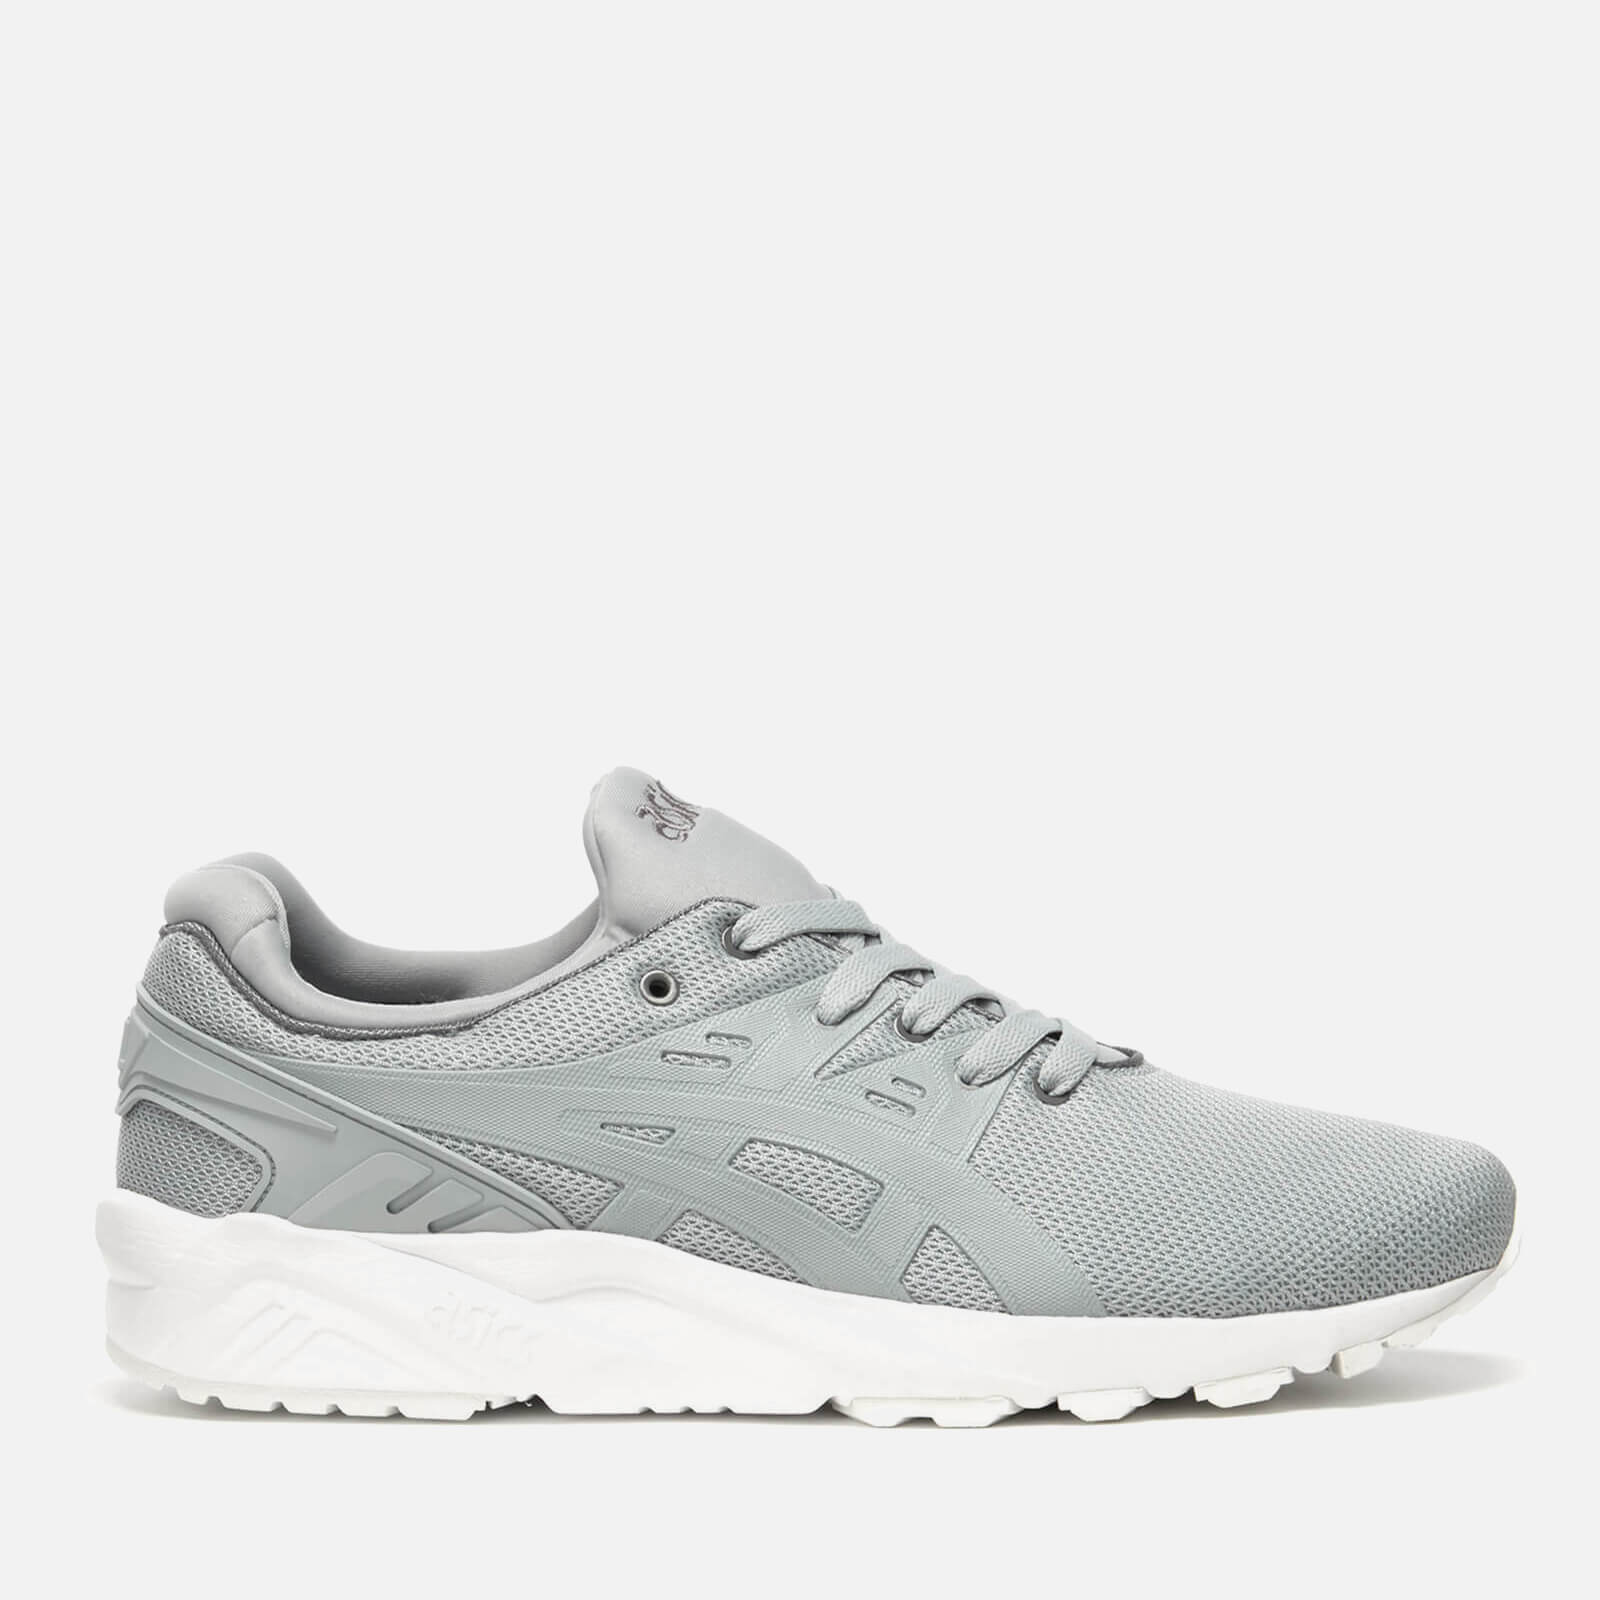 9beaa3b19 Asics Lifestyle Men s Gel-Kayano Evo Mesh Trainers - Mid Grey Mid Grey Mens  Footwear